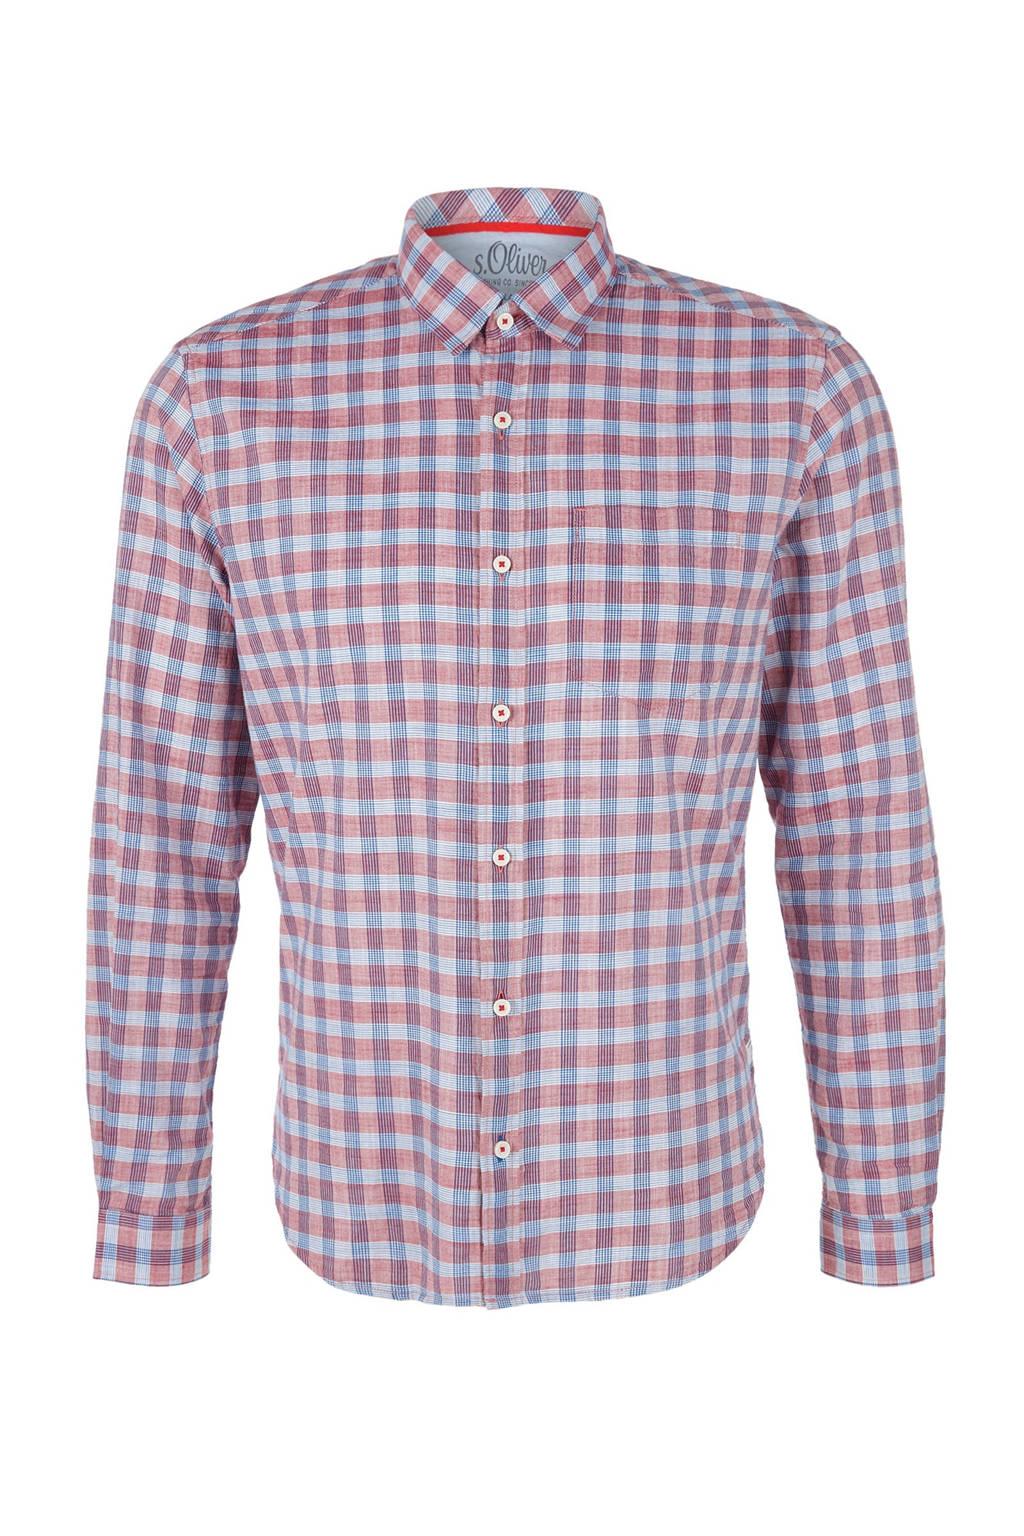 s.Oliver geruit regular fit overhemd rood, Rood/blauw